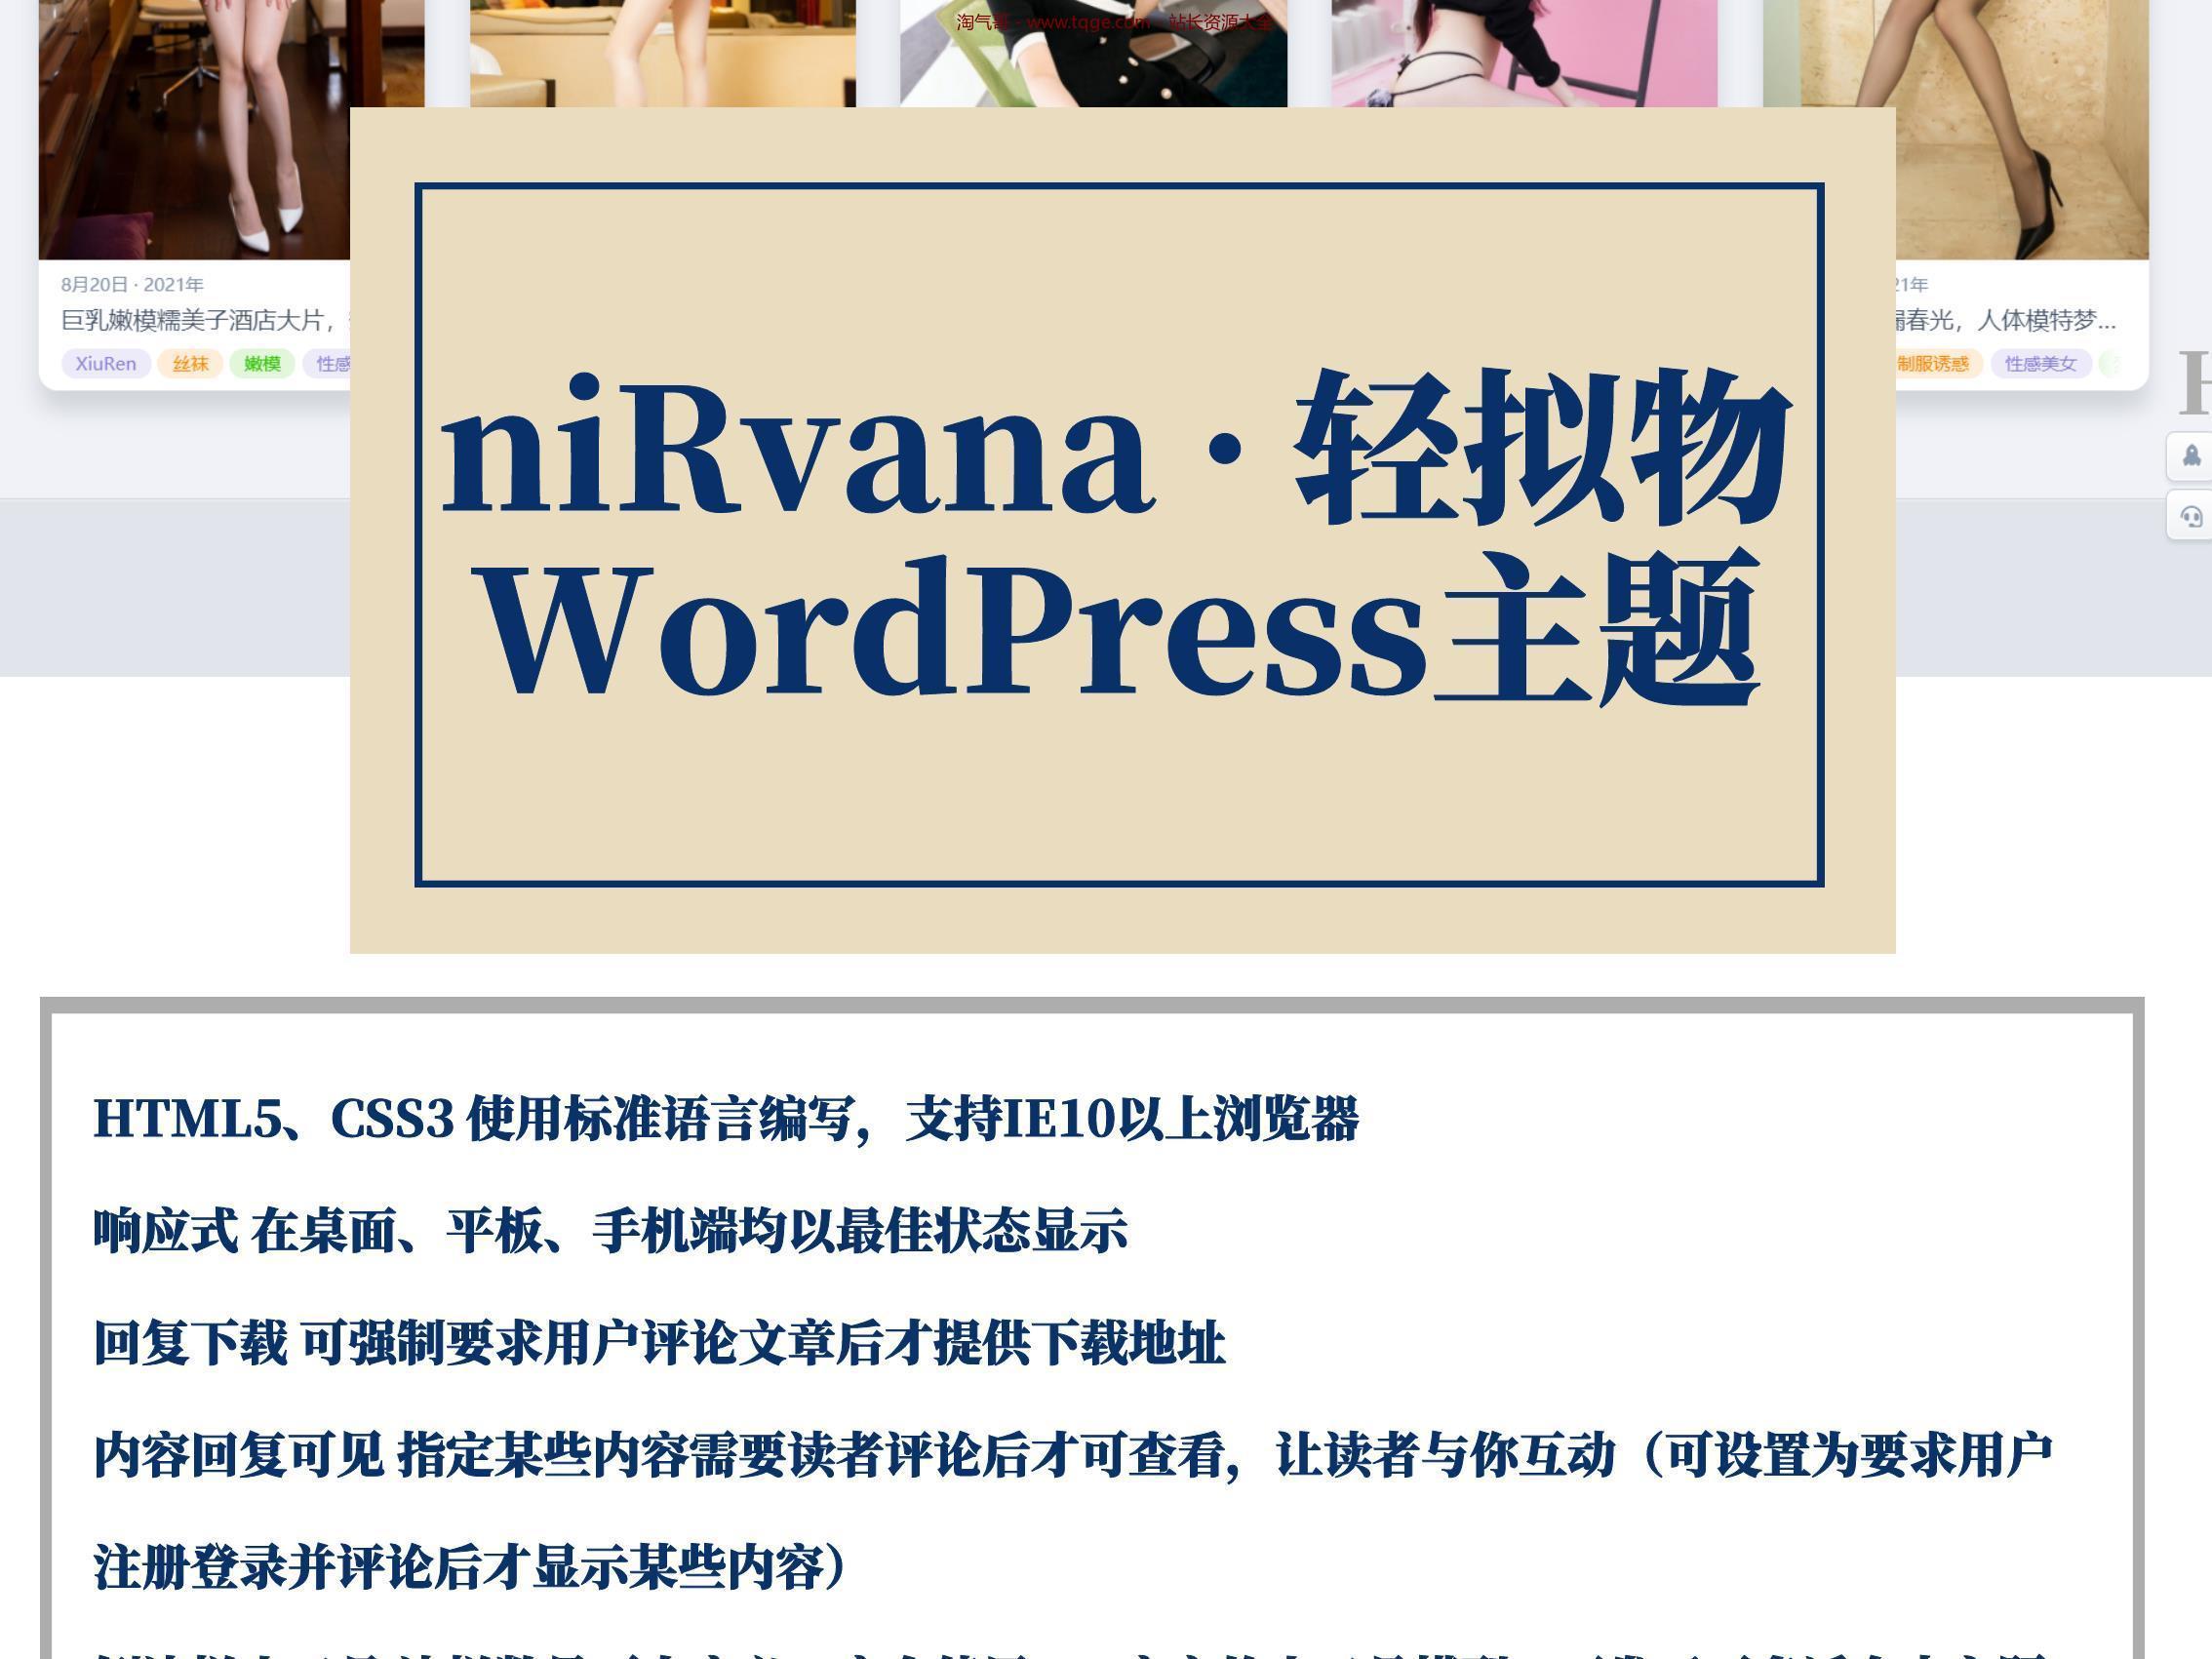 WordPress响应式轻拟物主题niRvana去授权图片网站源码带演示数据 Wordpress主题 第2张